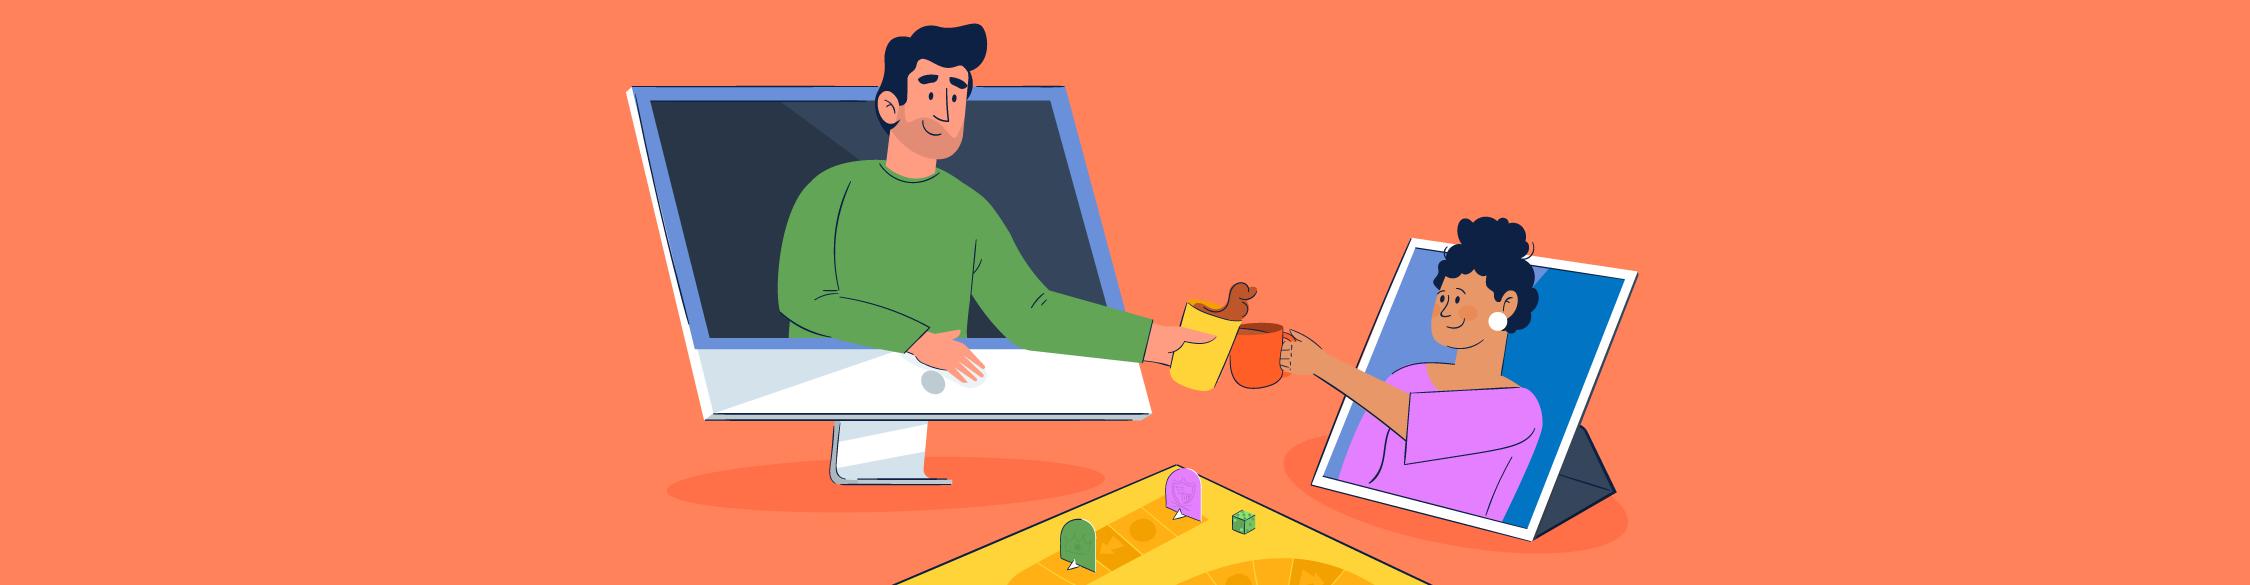 virtual team building activities - header